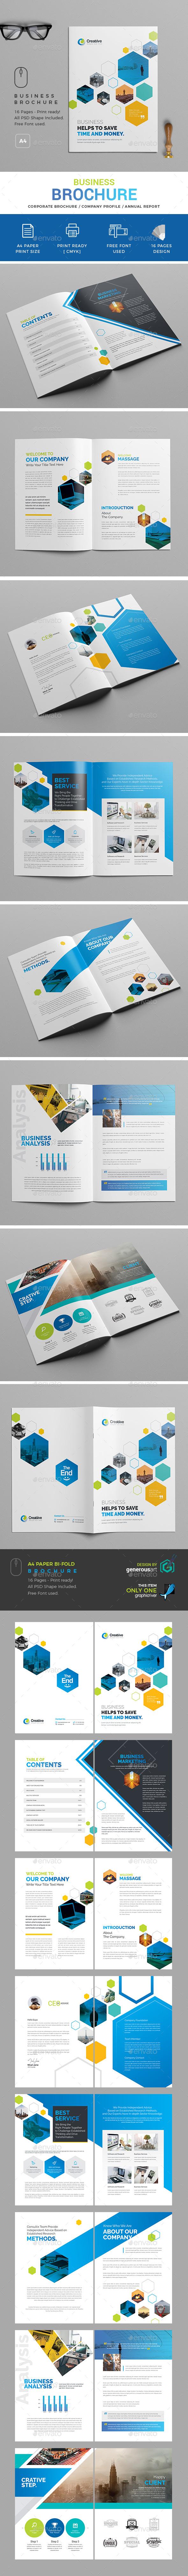 Business Bochure - Brochures Print Templates